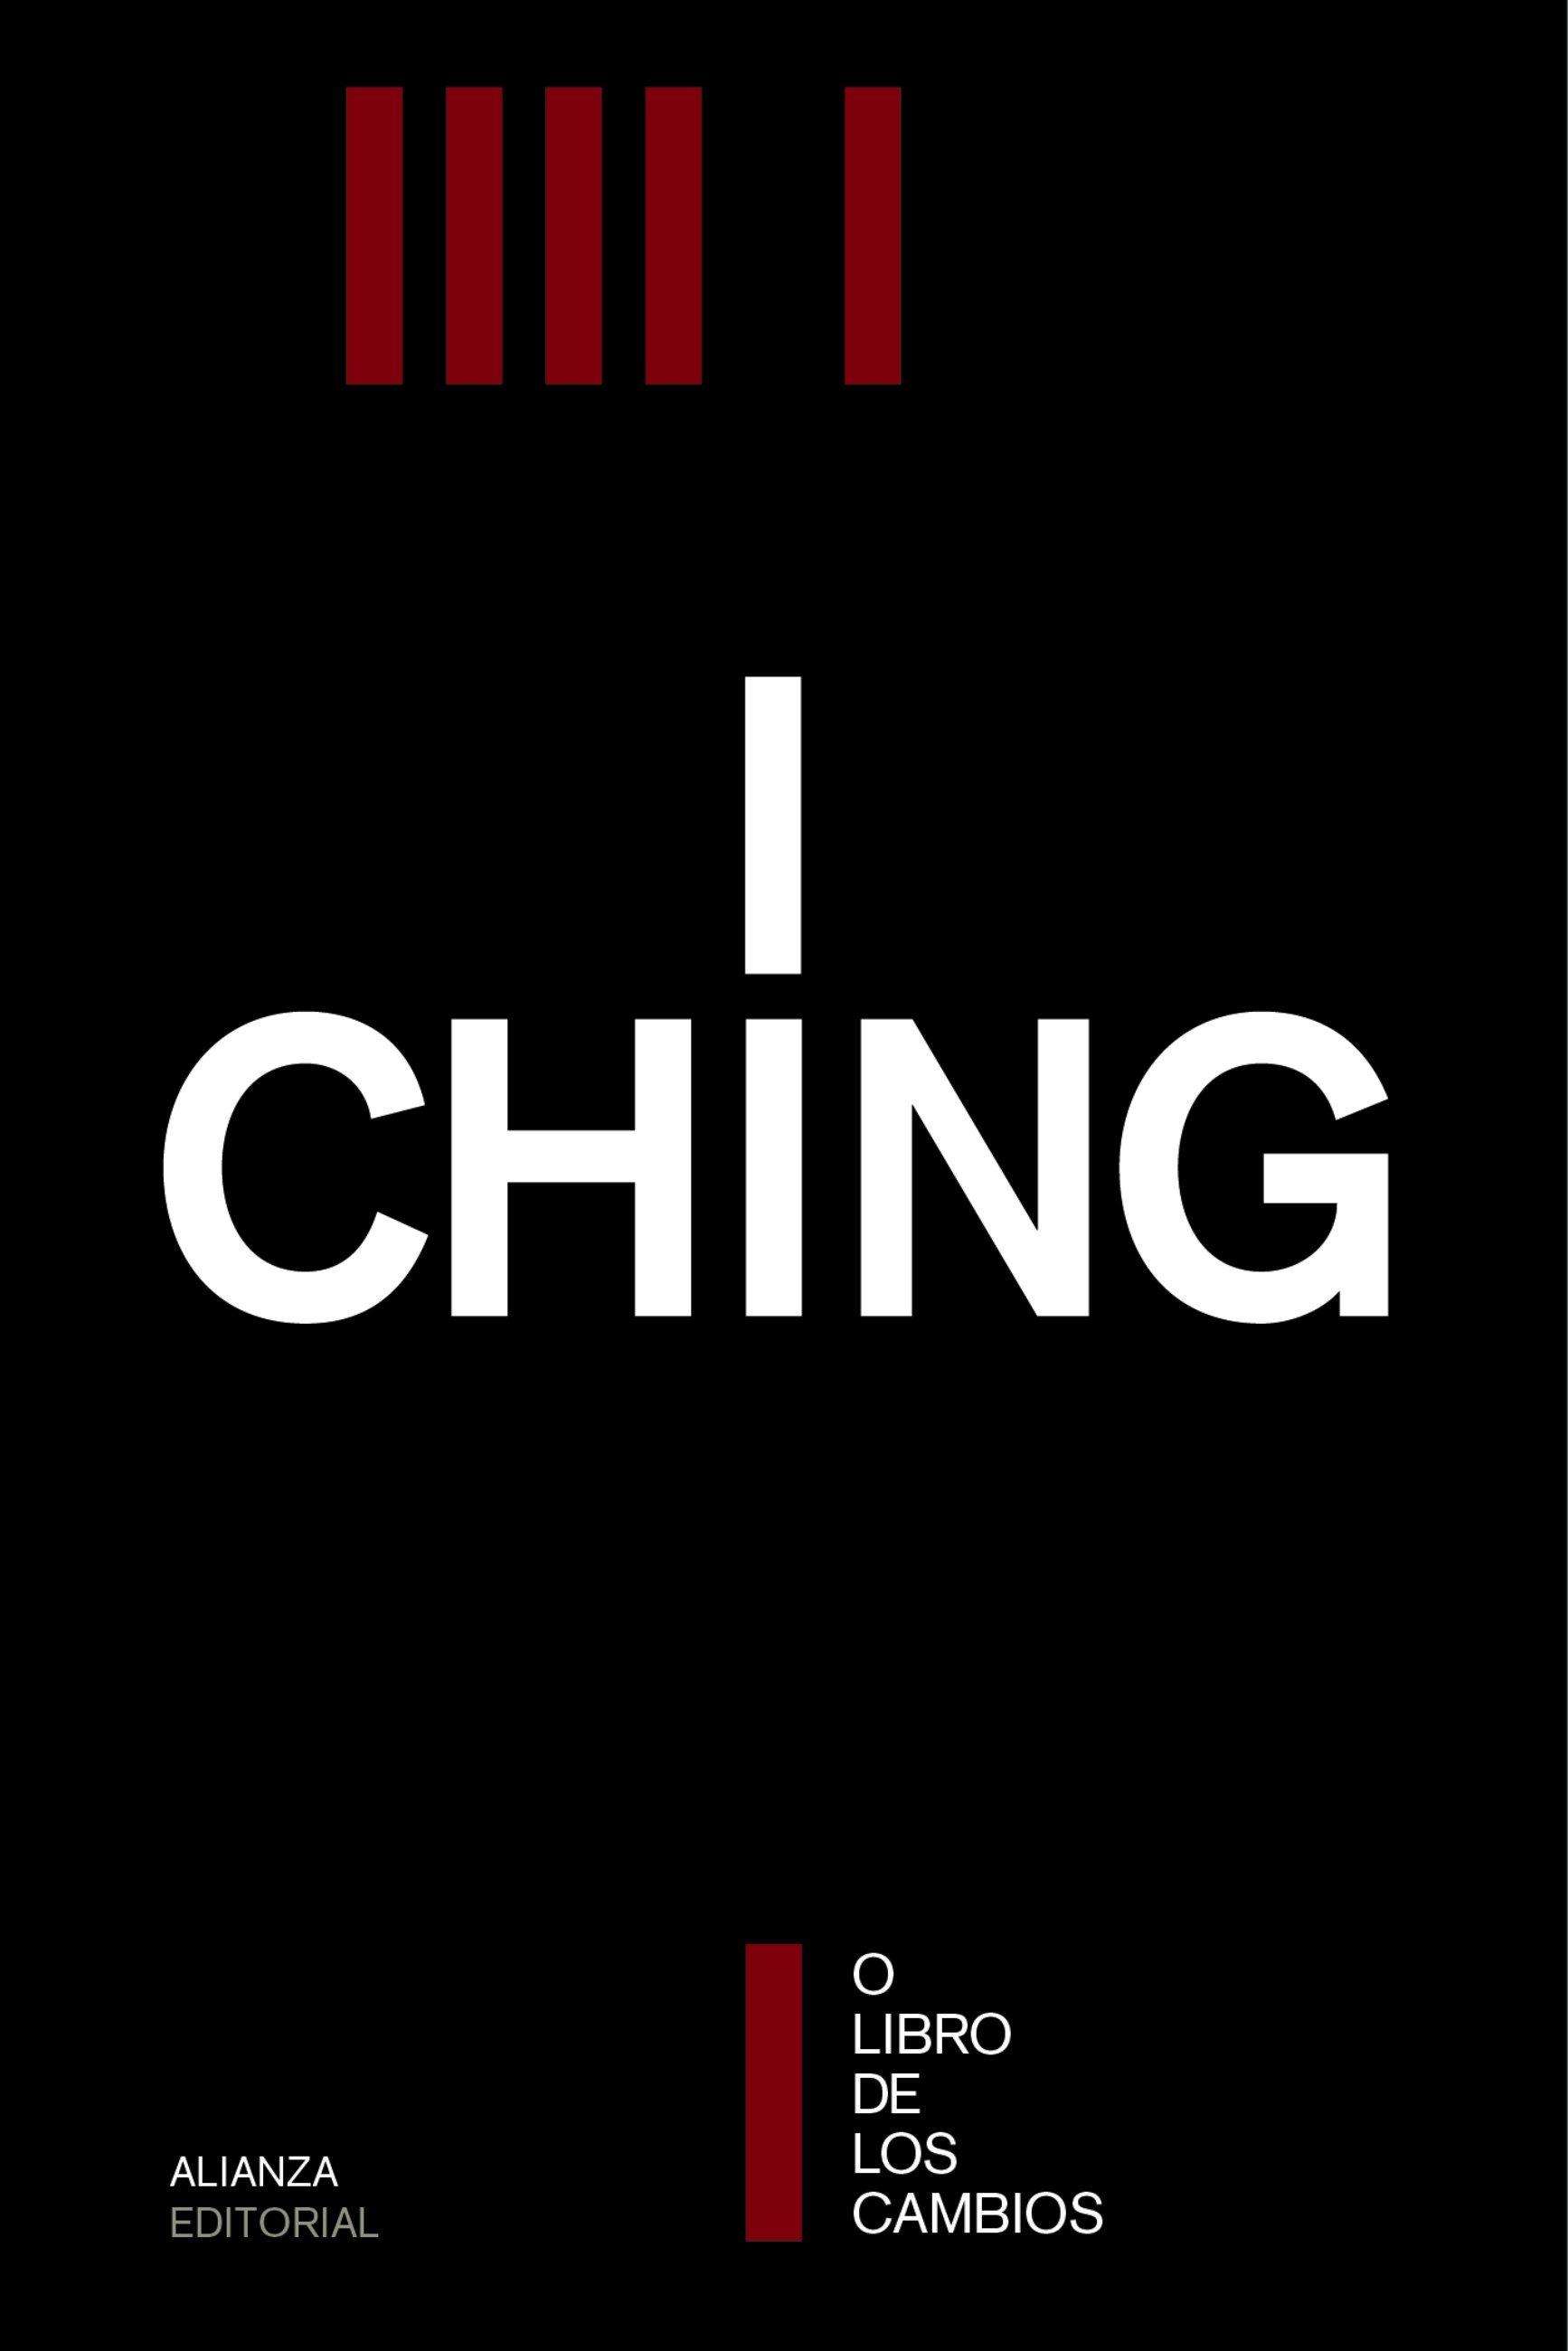 I ching ebook | helena jacoby de hoffman | descargar libro pdf o.